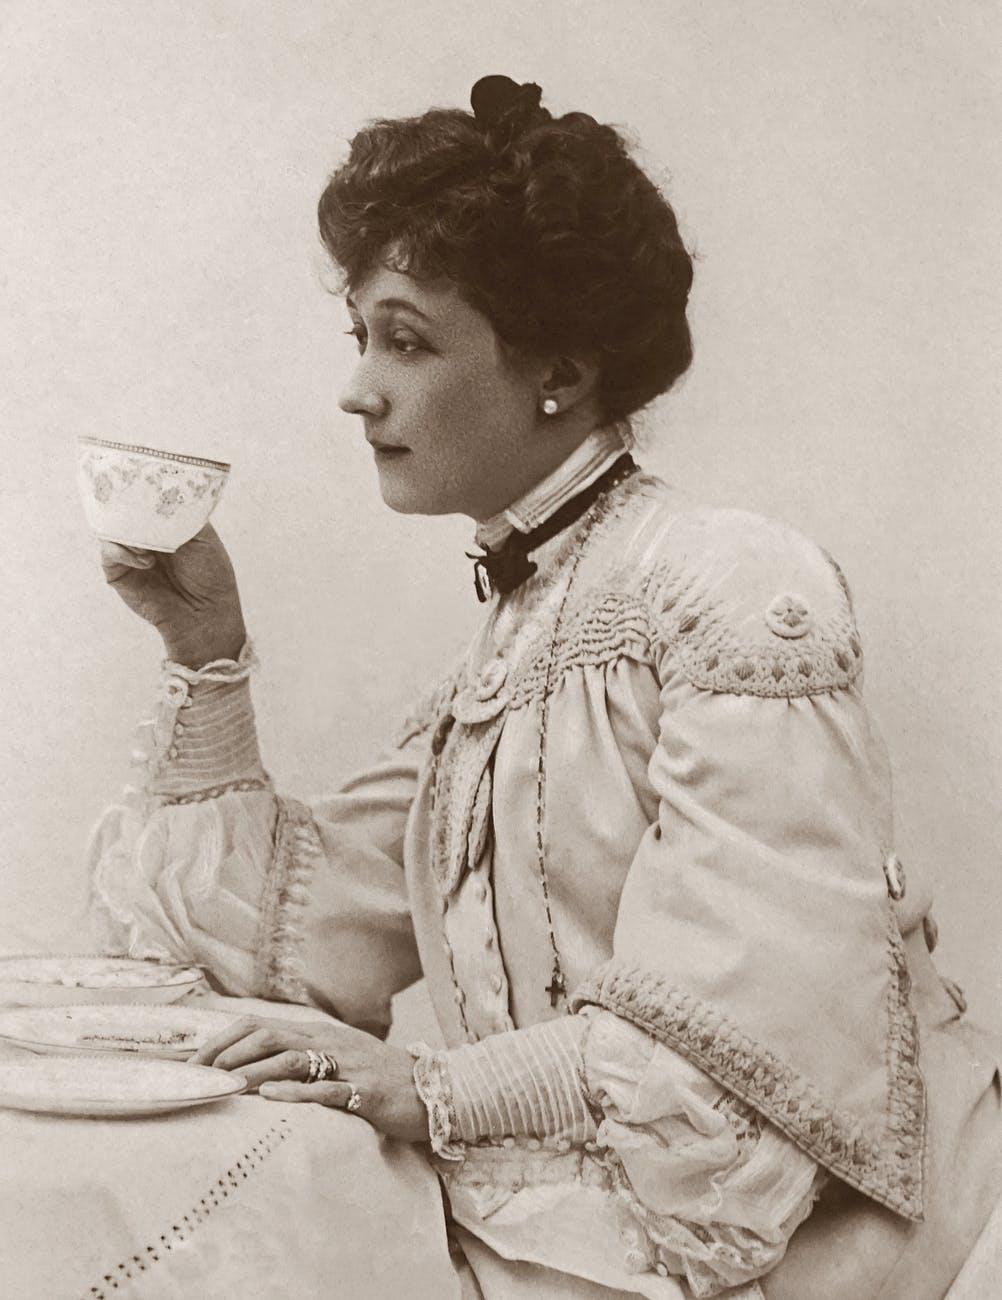 Victorian dressed woman drinking tea